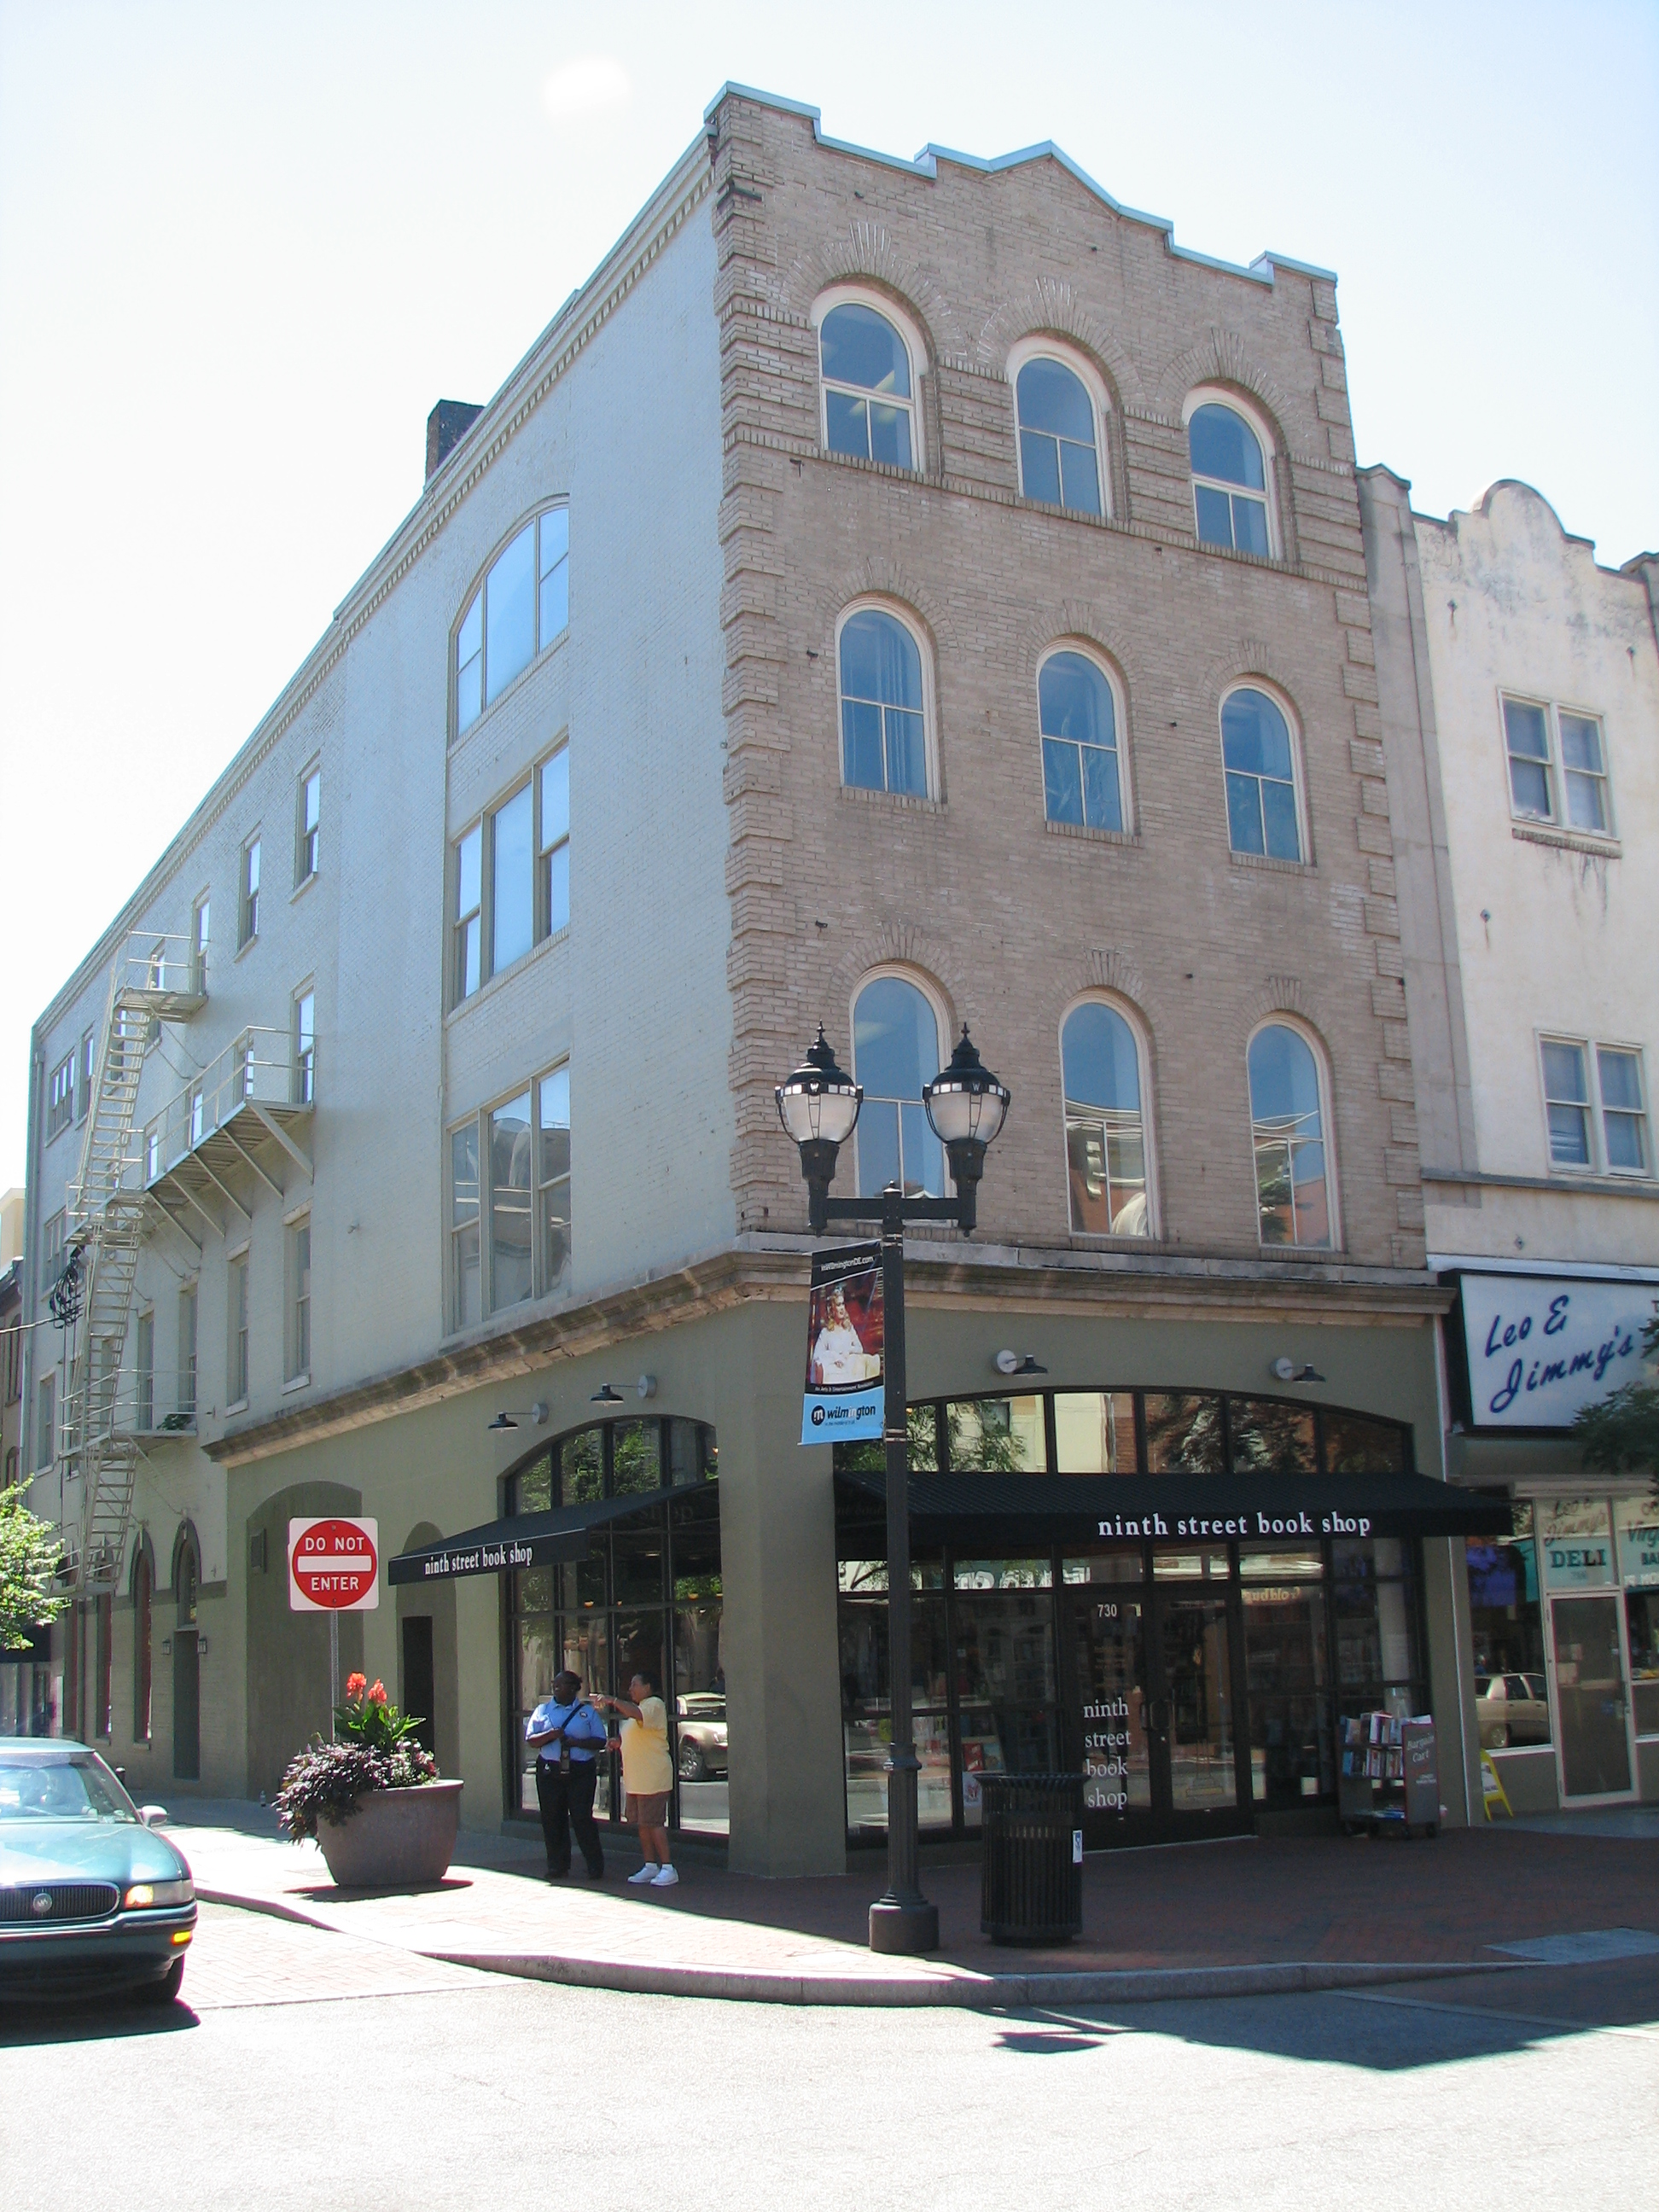 Ninth Street Book Shop at 730 Market Street Wilmington, DE